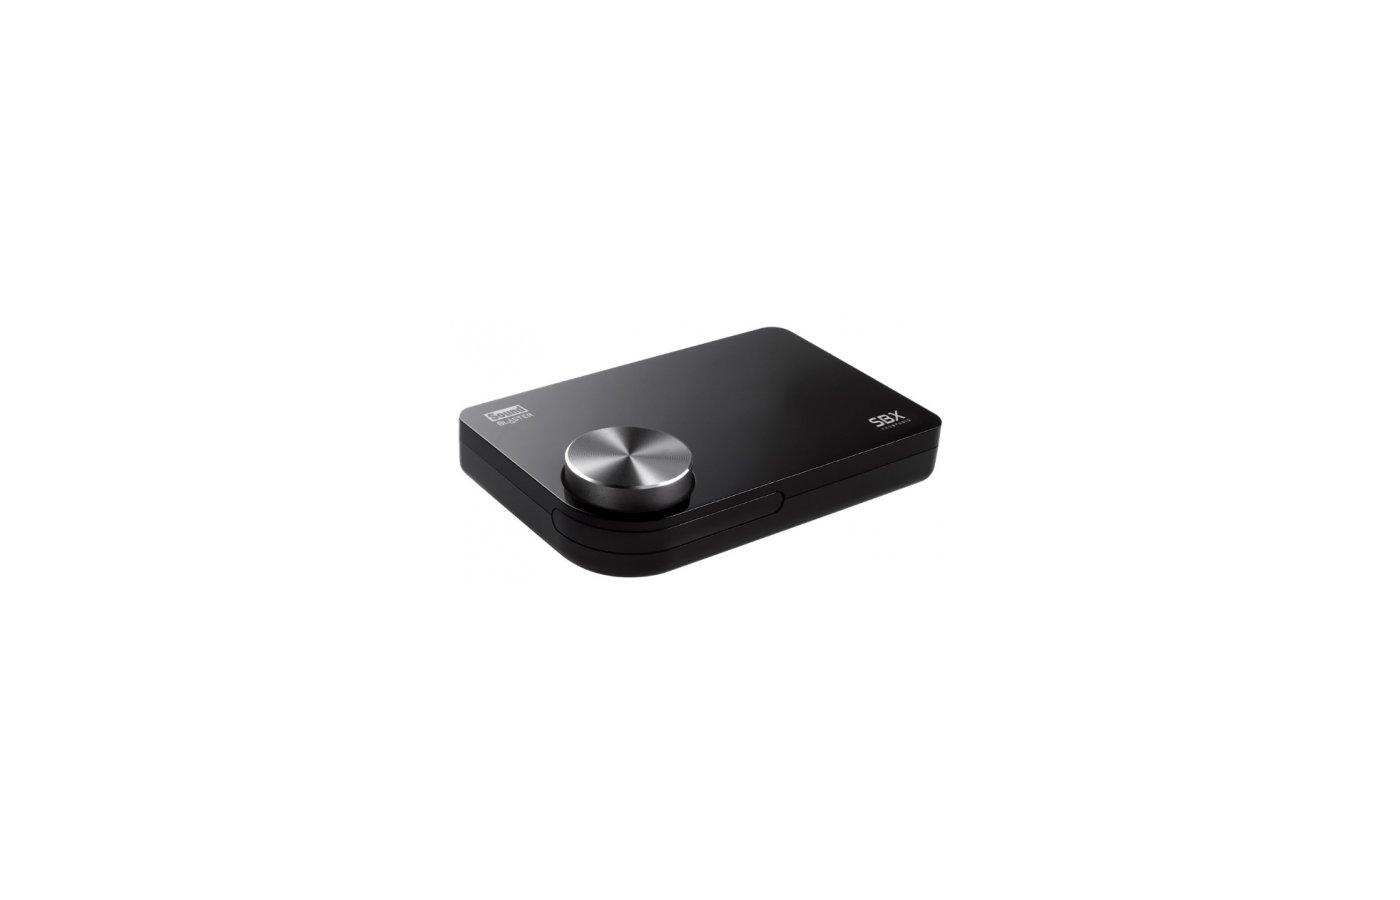 Звуковая карта Creative USB X-Fi Sound Blaster Surround 5.1 Pro (X-Fi) 5.1 Ret